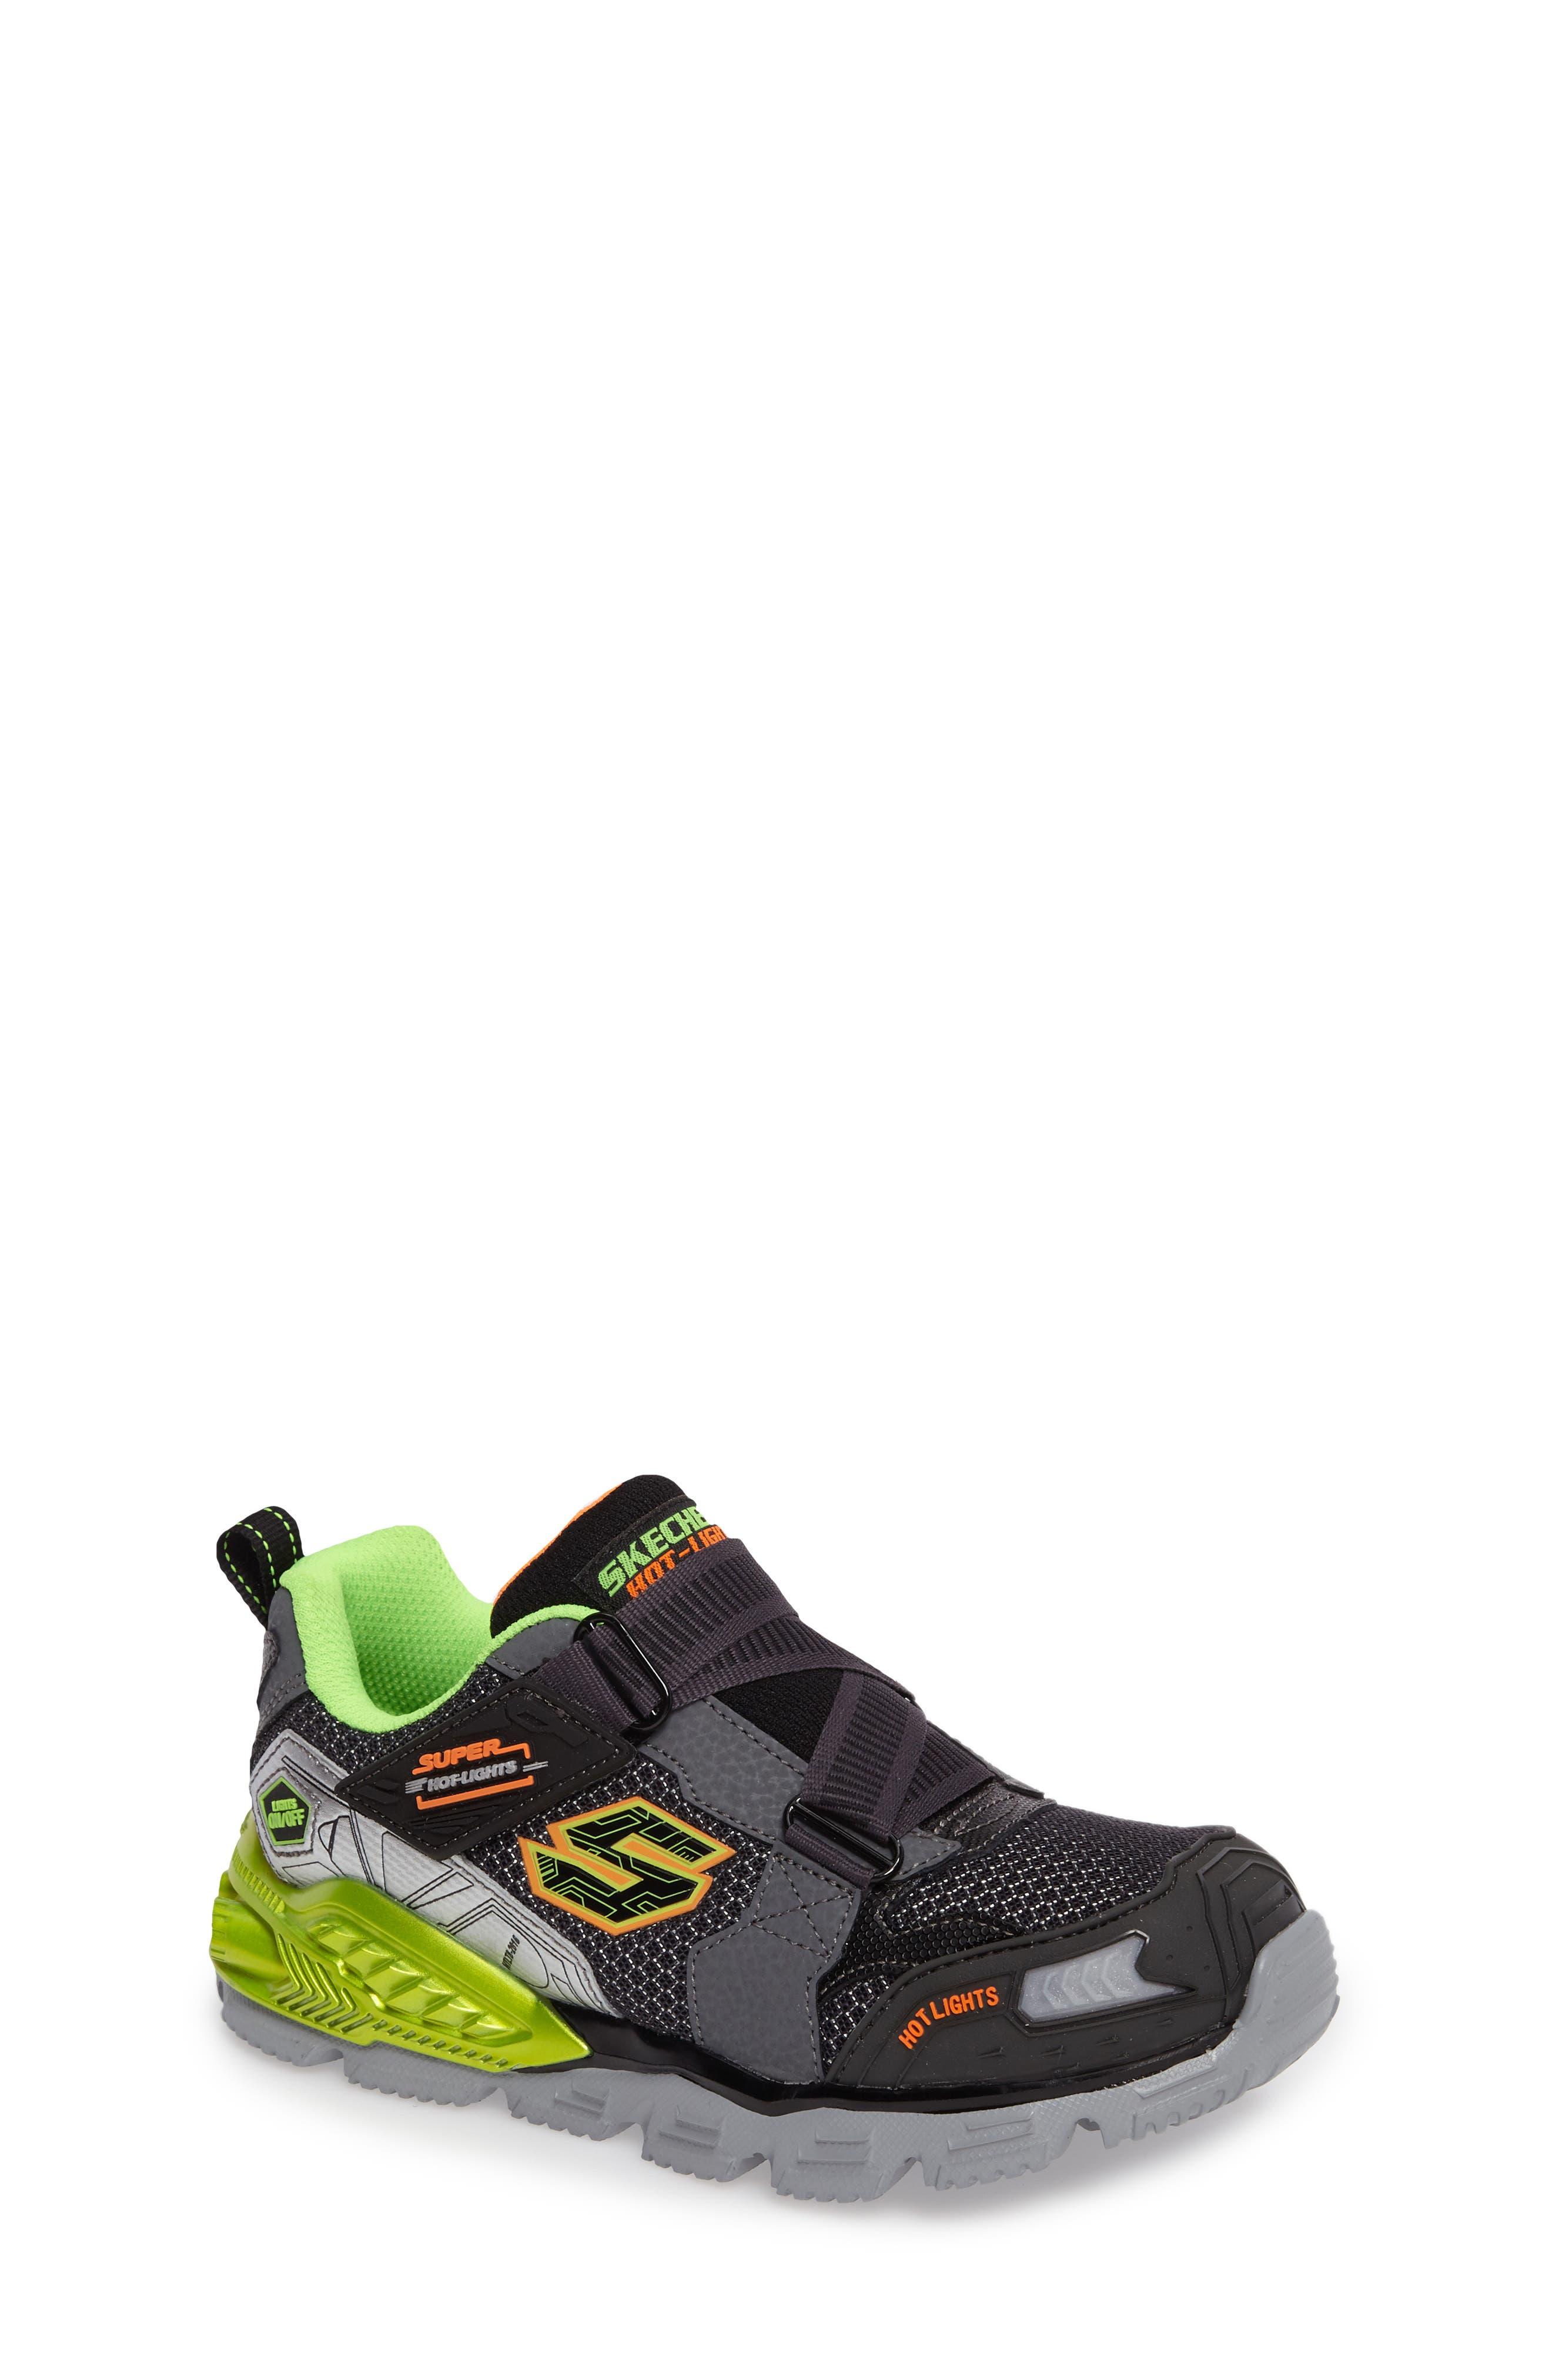 SKECHERS Hot Lights Orbiters Sneakers (Toddler & Little Kid)